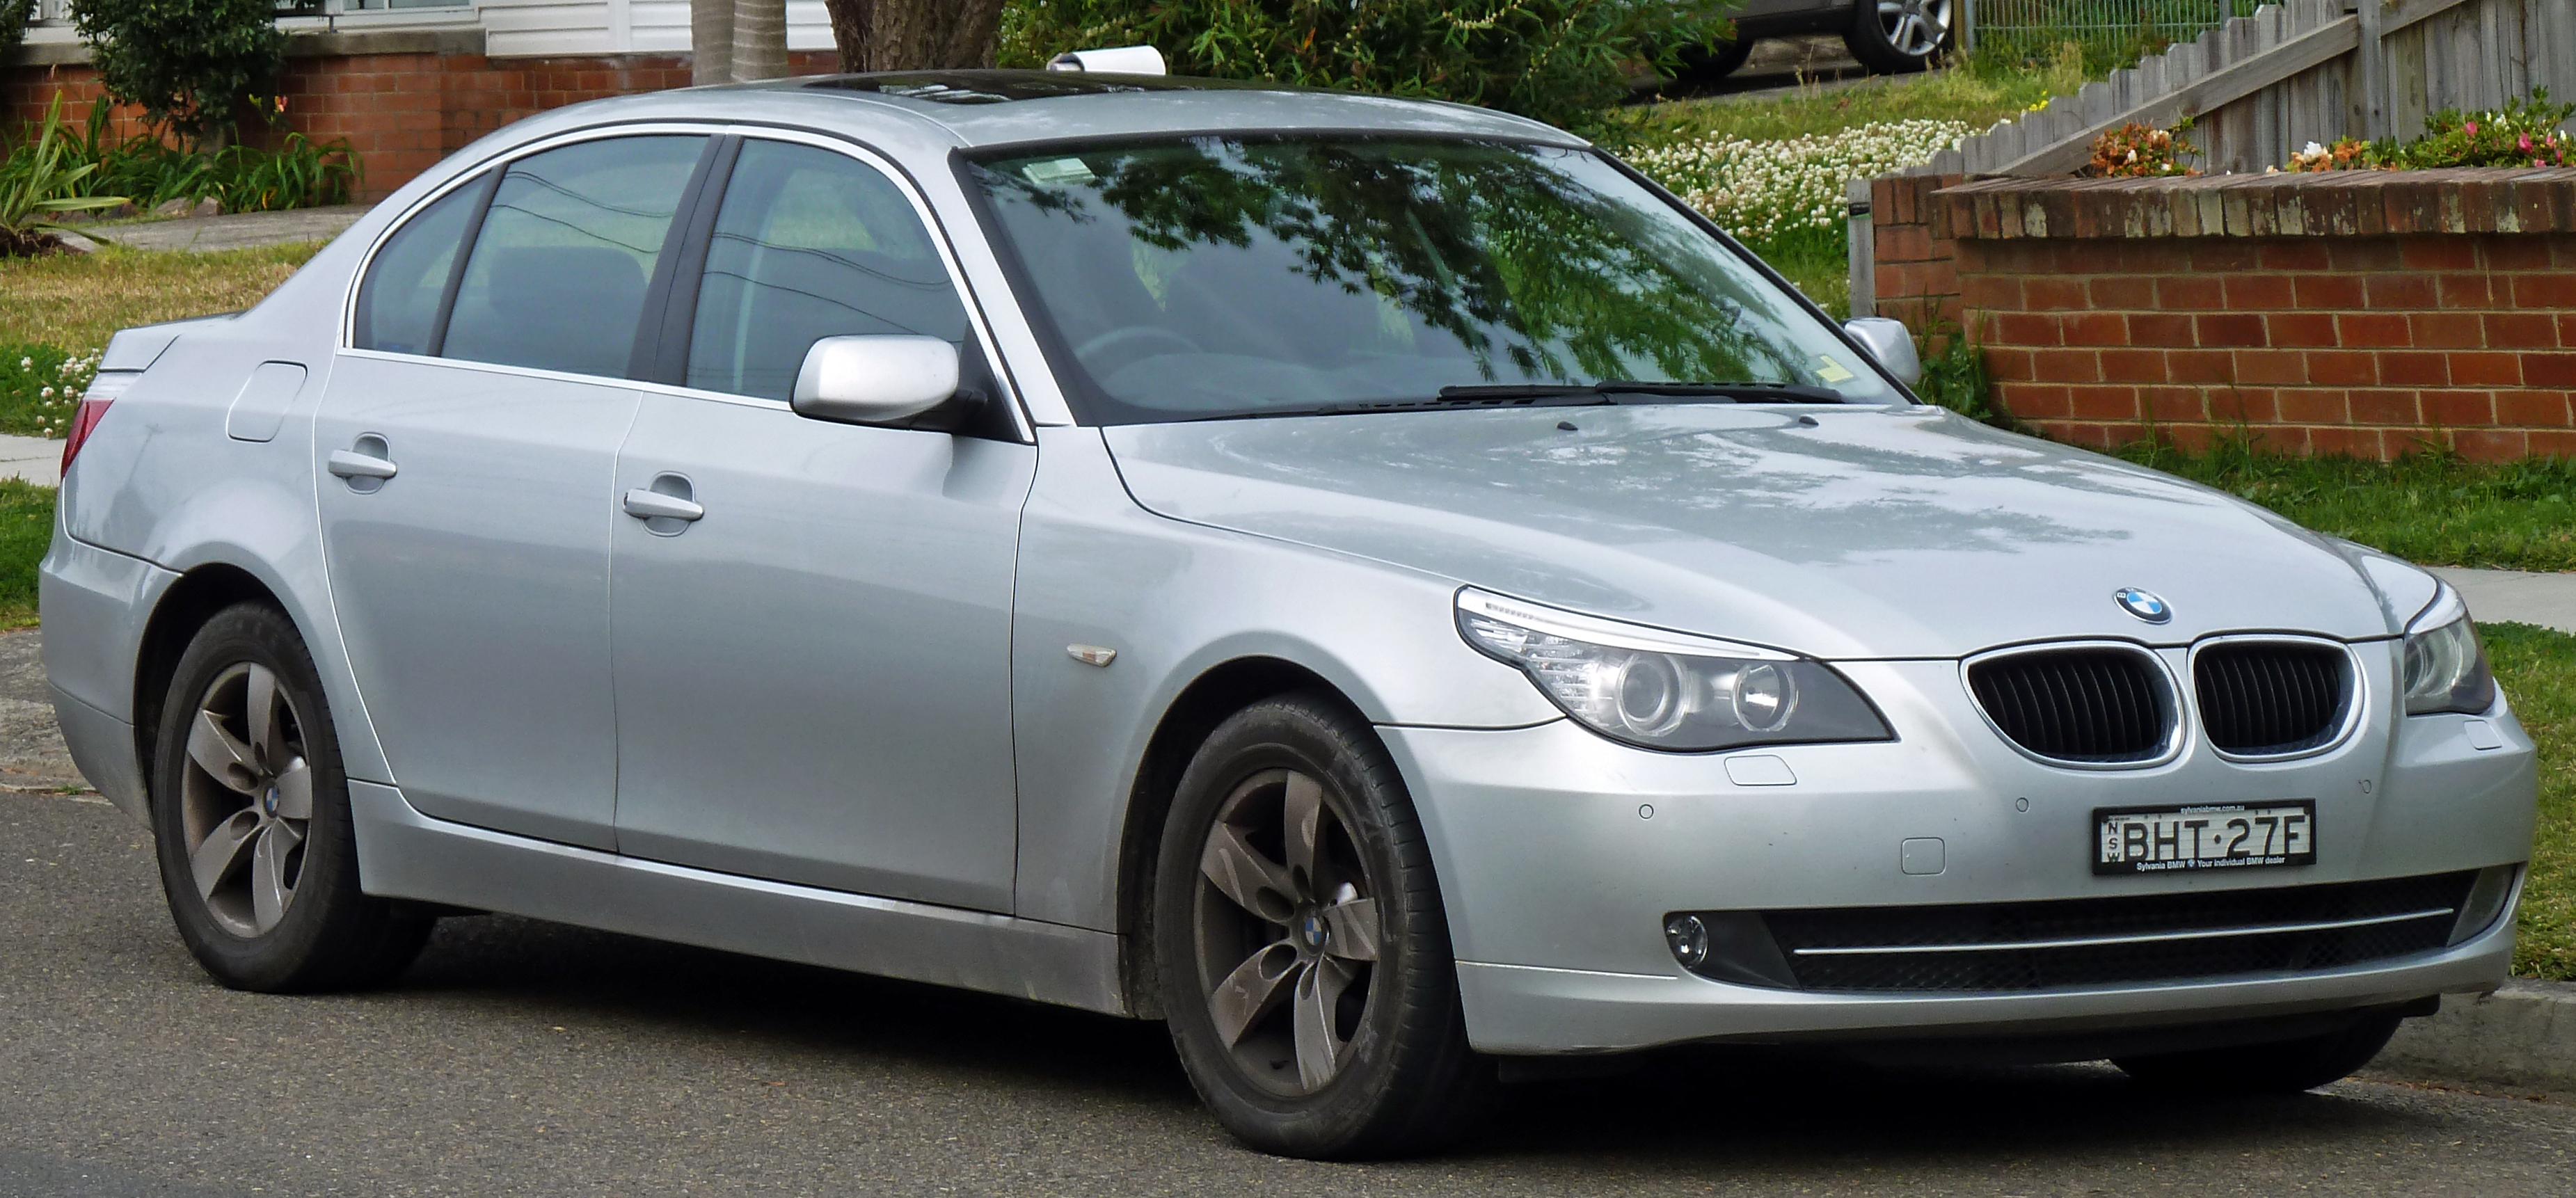 BMW 520d Photo 01